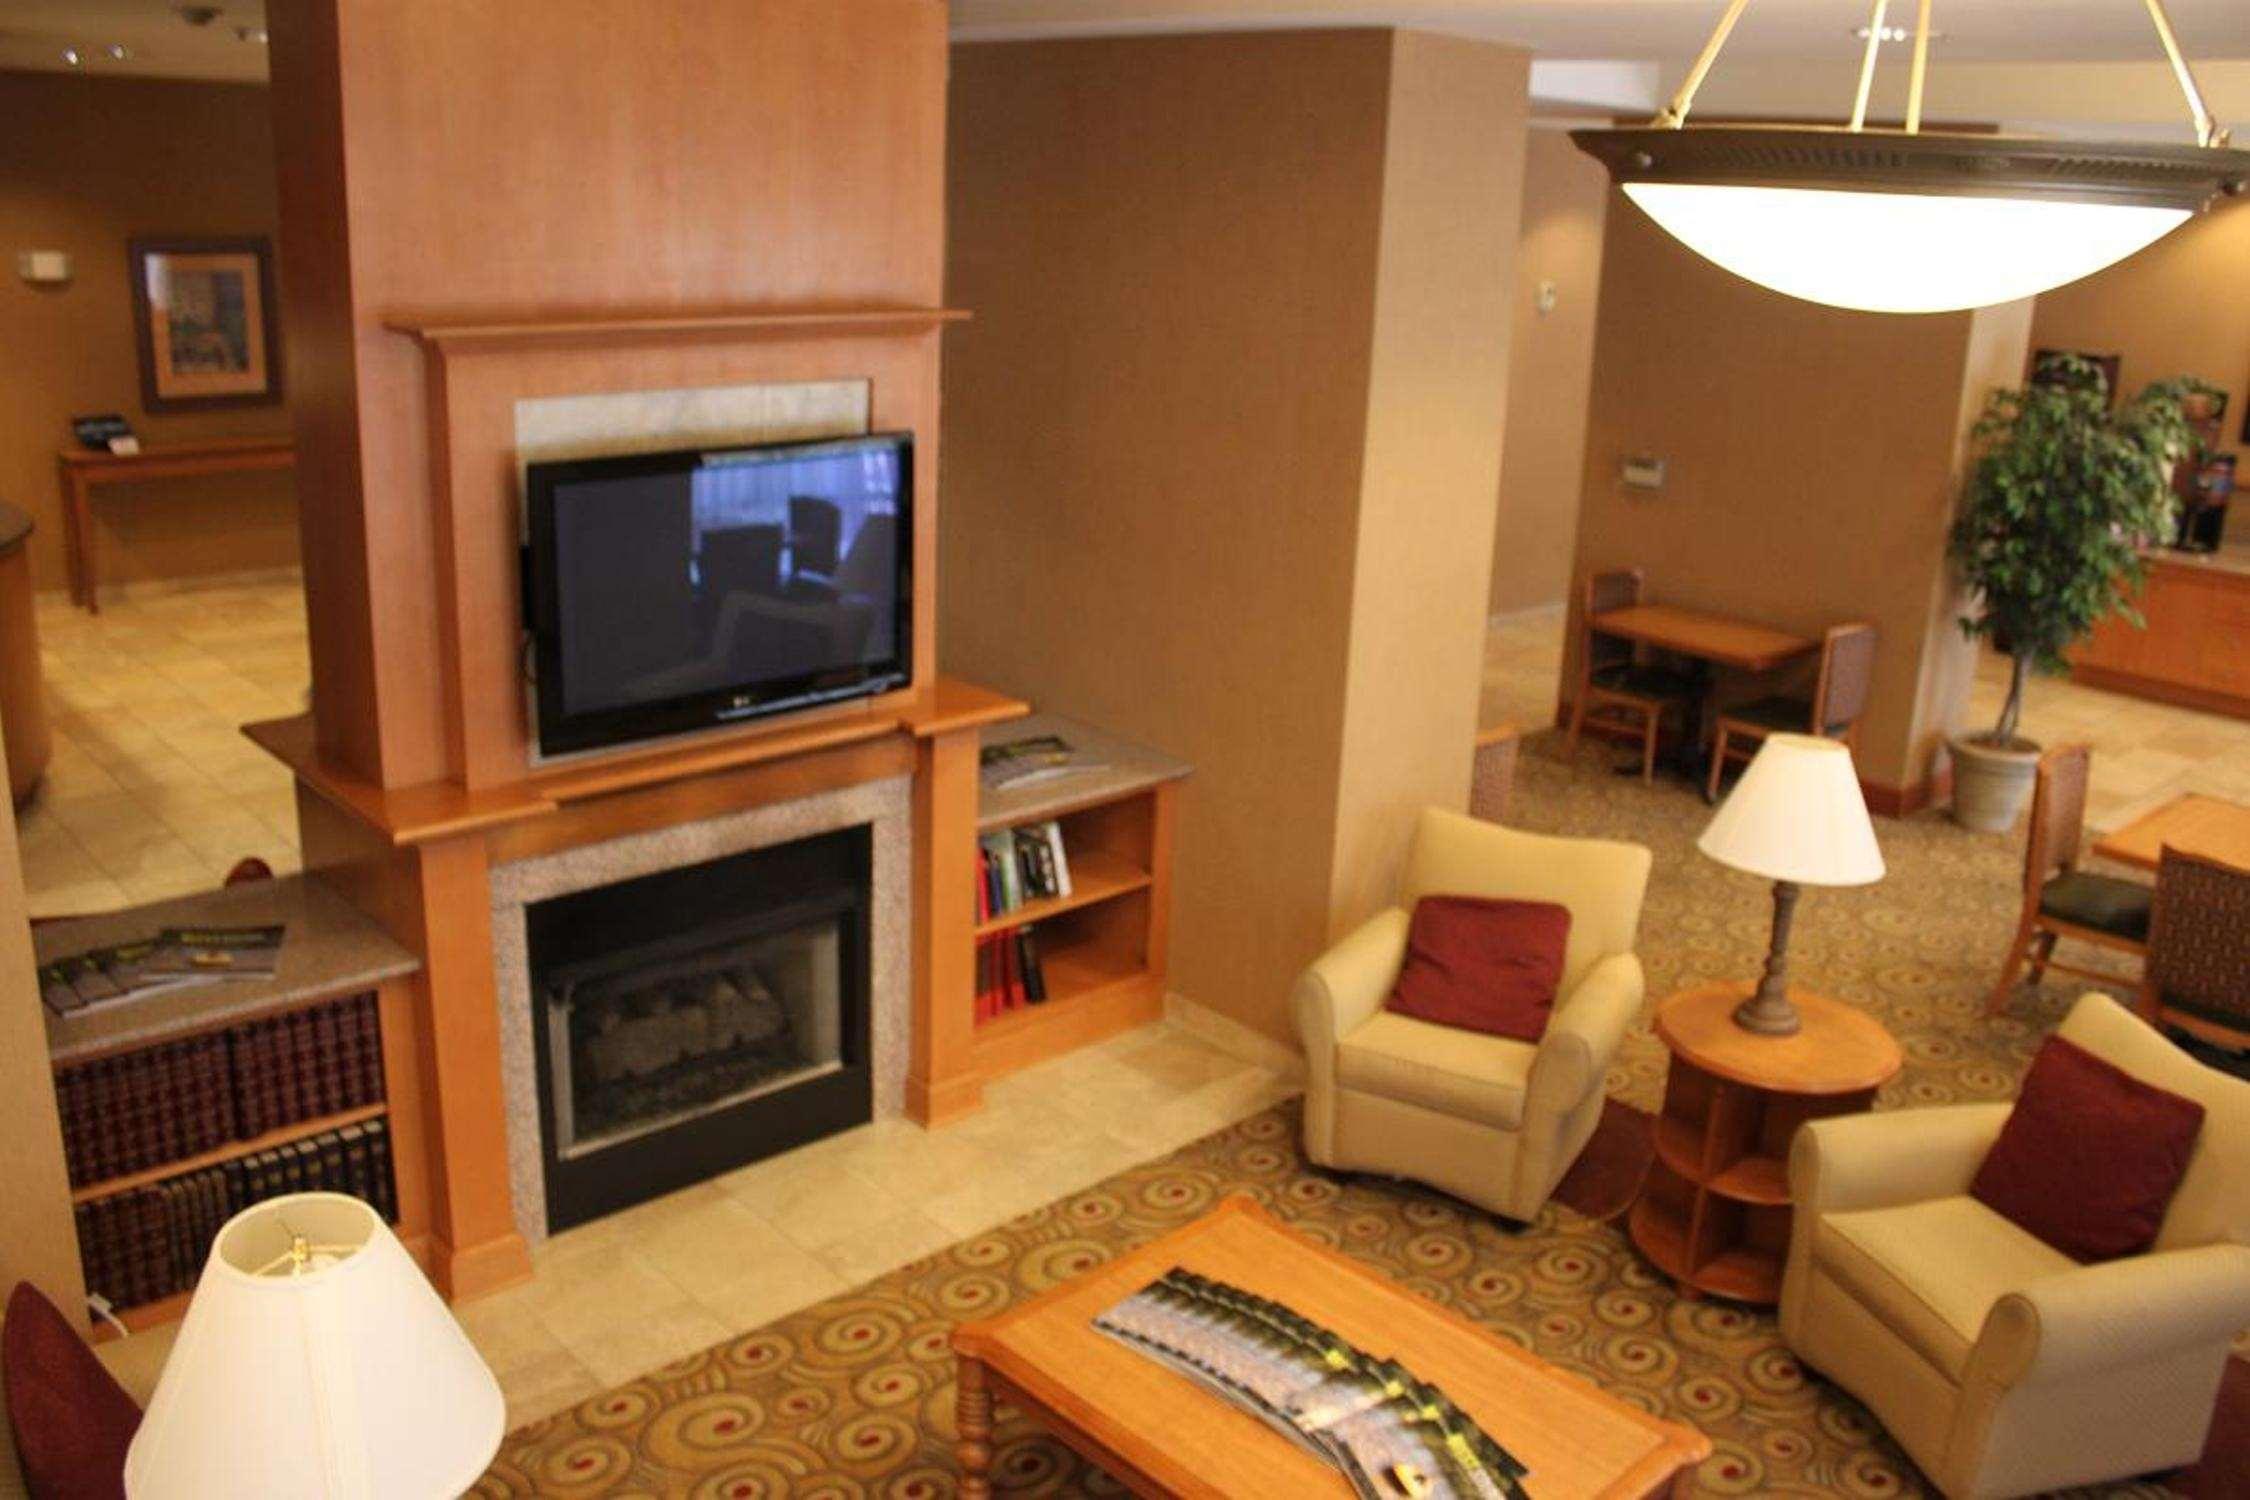 Hampton Inn & Suites Bremerton image 8